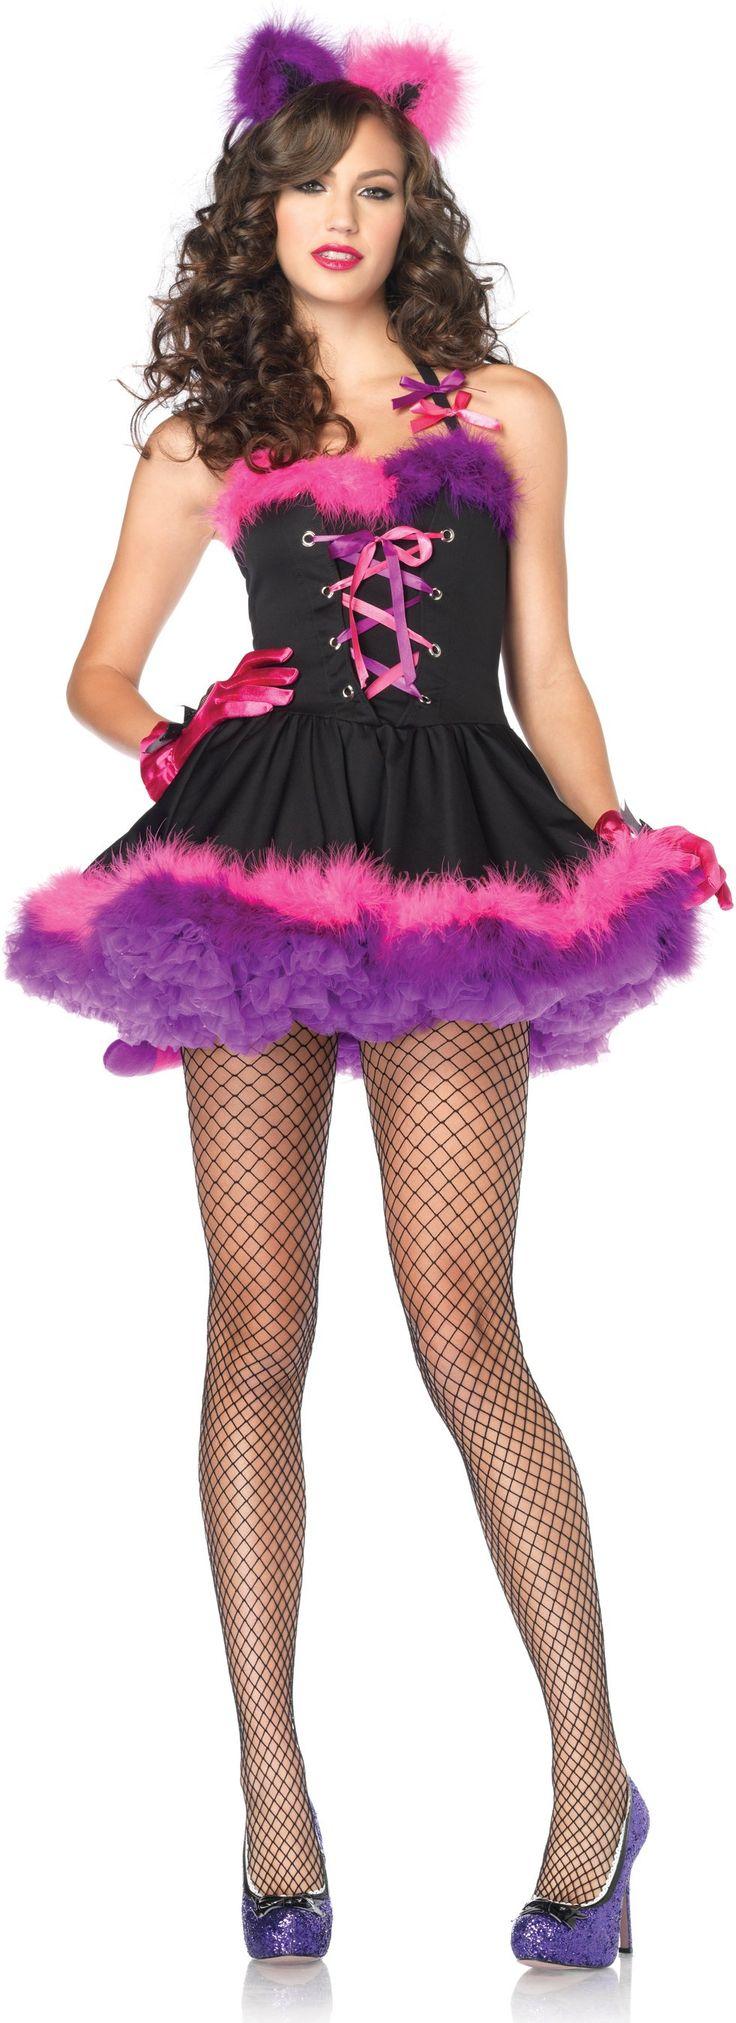 mischievous chesire cat costume (adult)